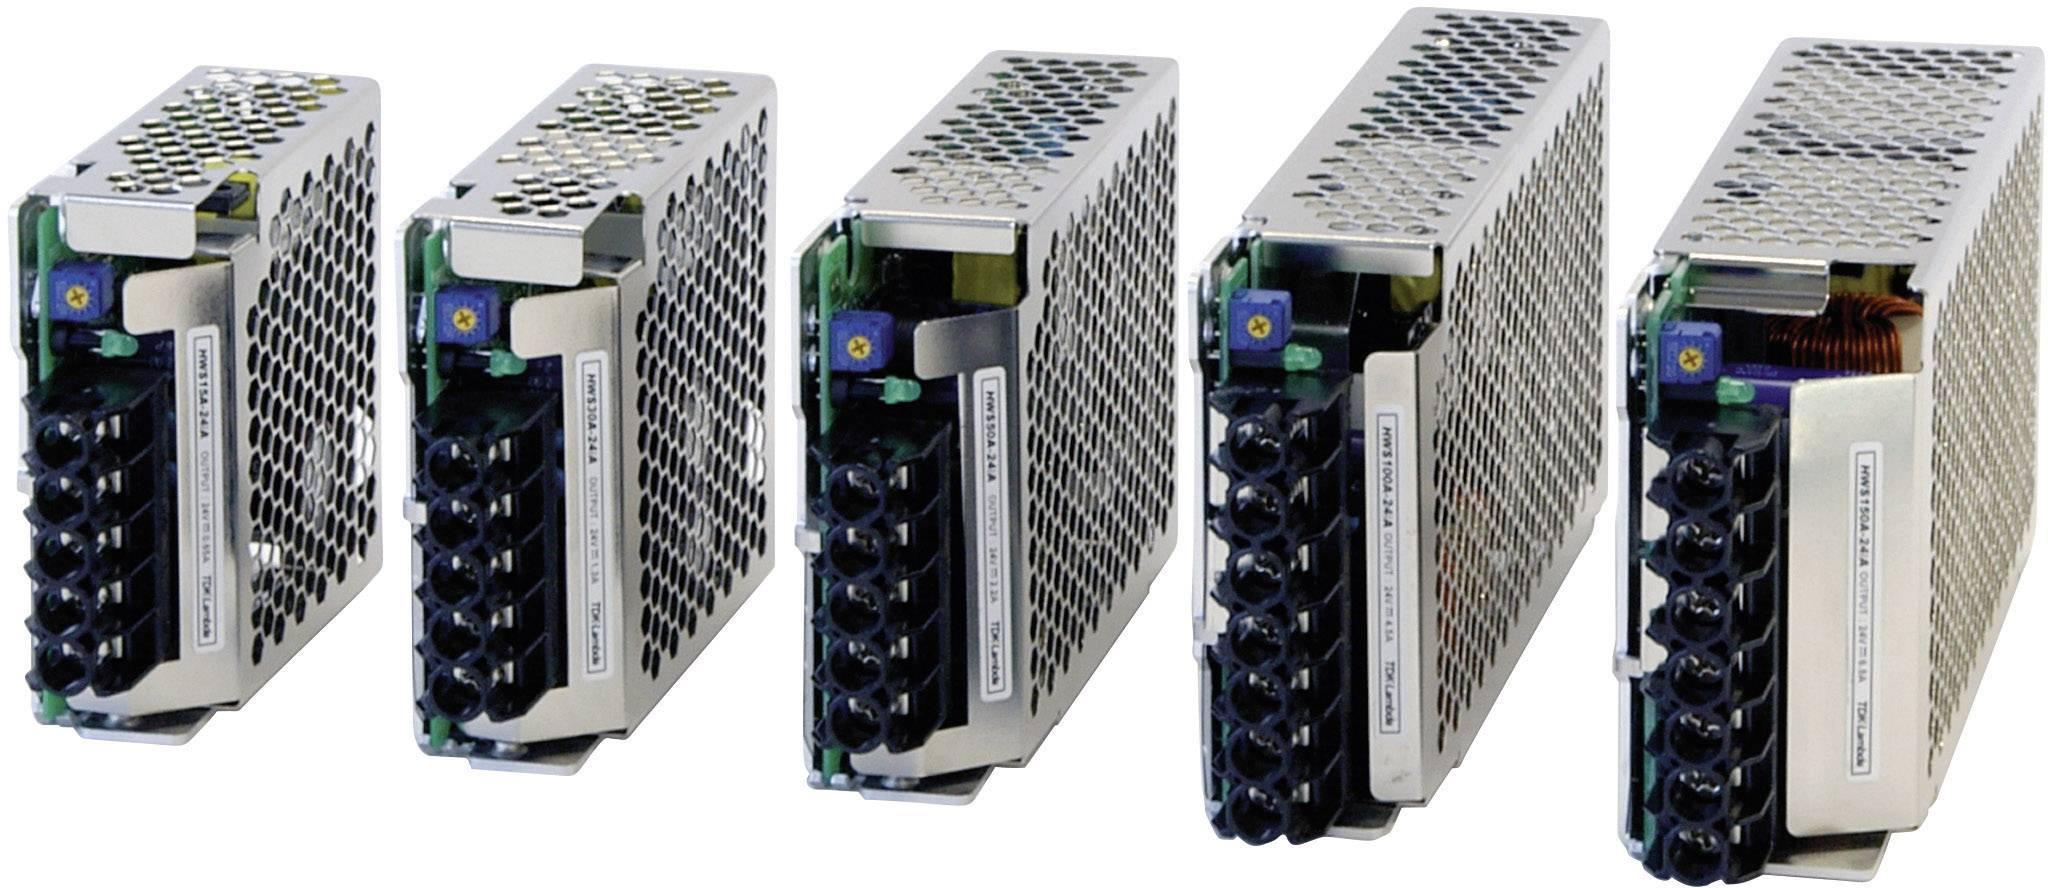 Zabudovateľný napájací zdroj TDK-Lambda HWS-150A-48, 48 V, 158,4 W